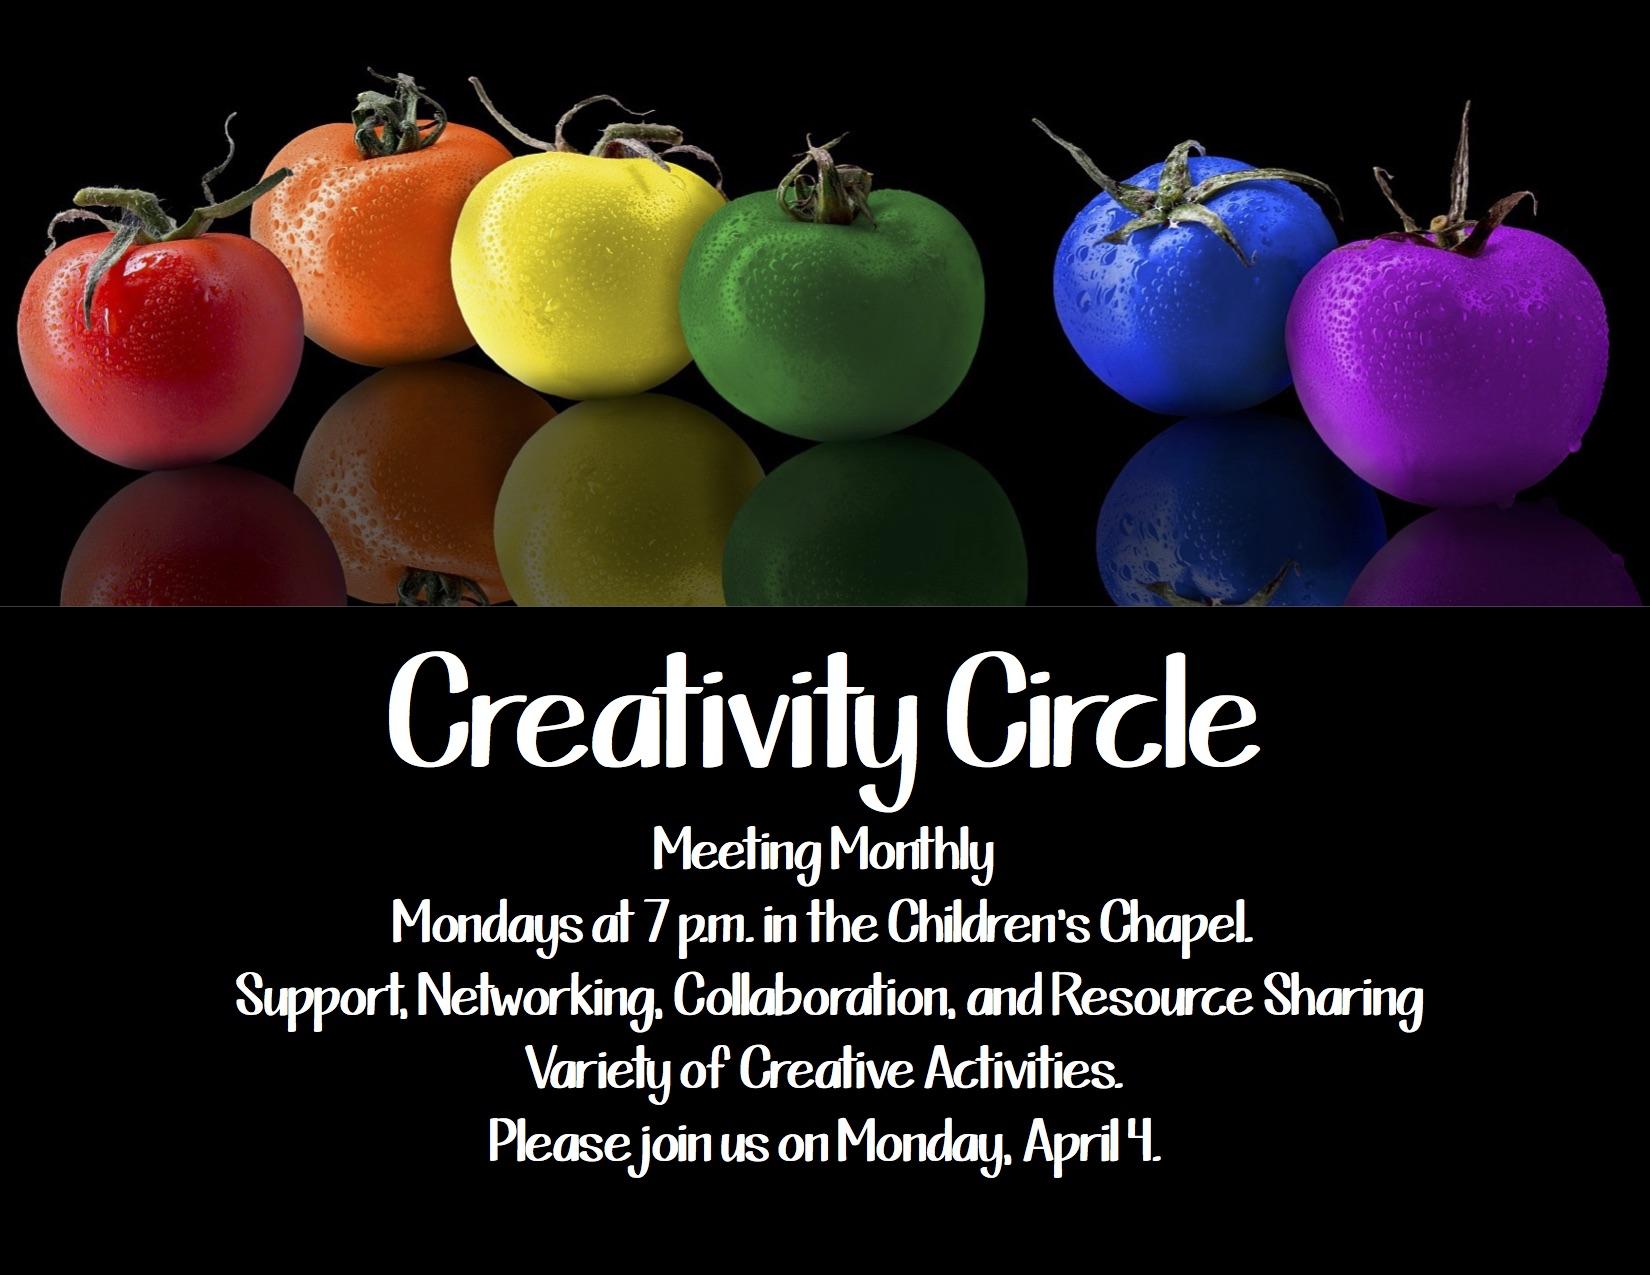 Creativity Circle